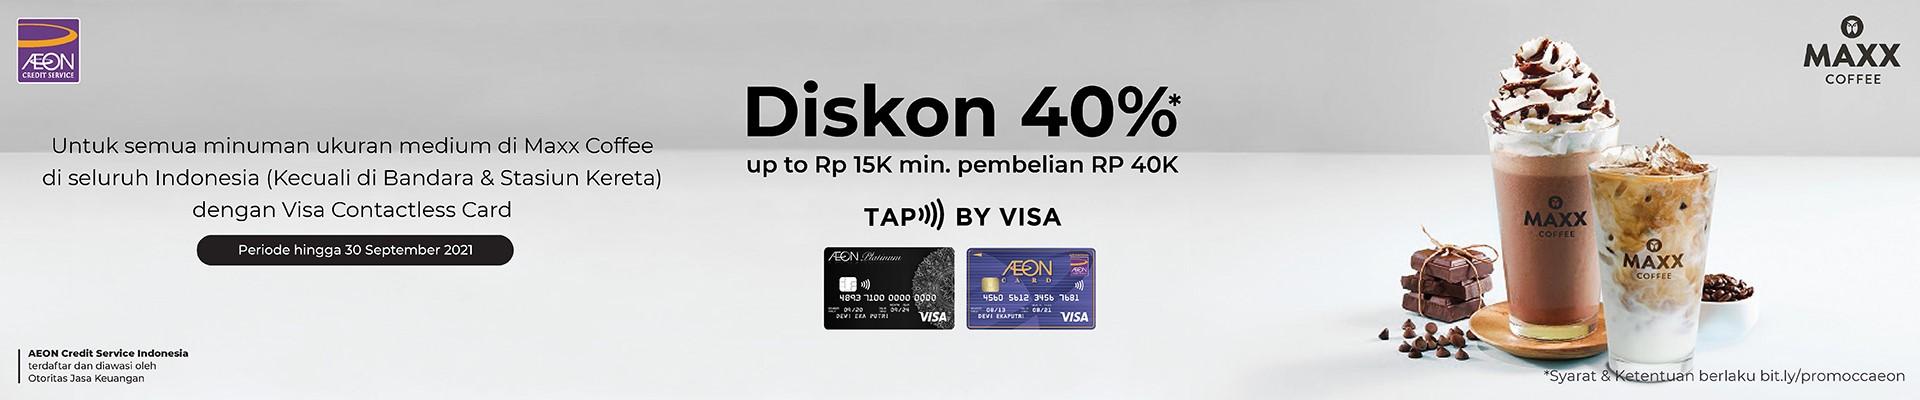 Visa Epic Experiences Diskon 40% di Maxx Coffee dengan Kartu Kredit AEON Contactless